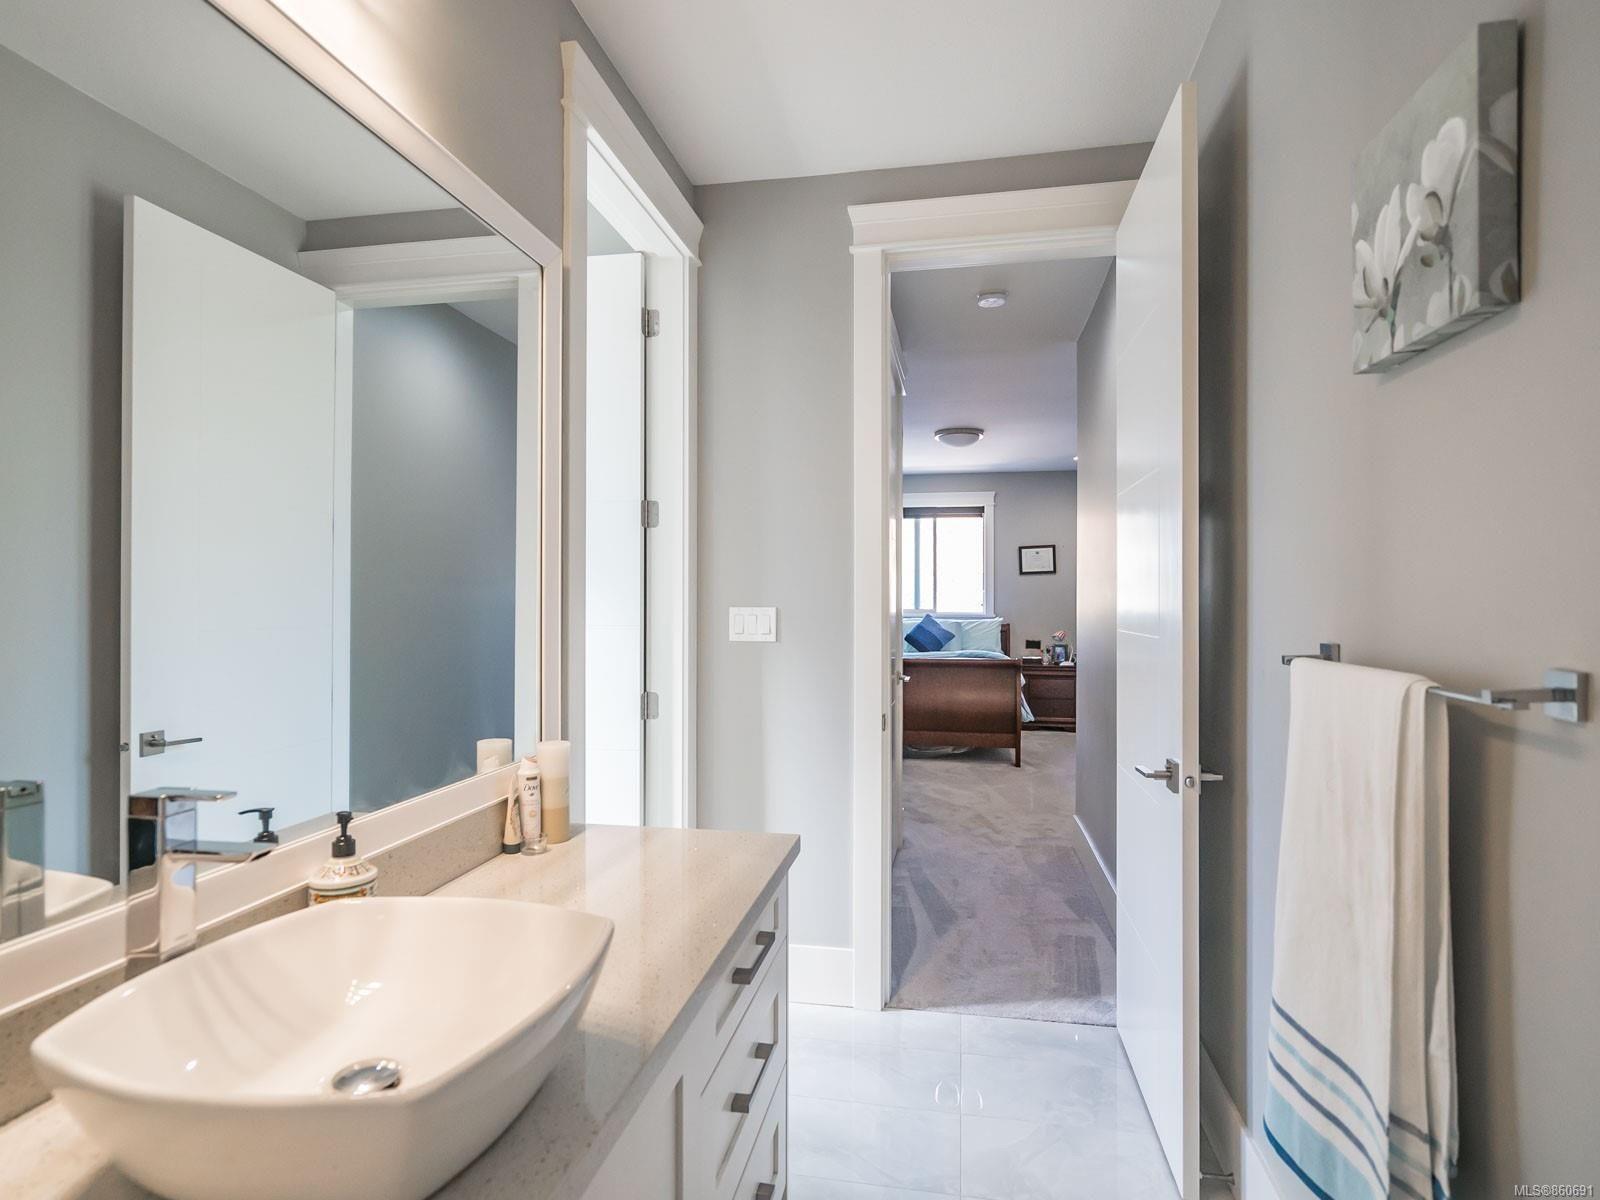 Photo 37: Photos: 5821 Linley Valley Dr in : Na North Nanaimo House for sale (Nanaimo)  : MLS®# 860691